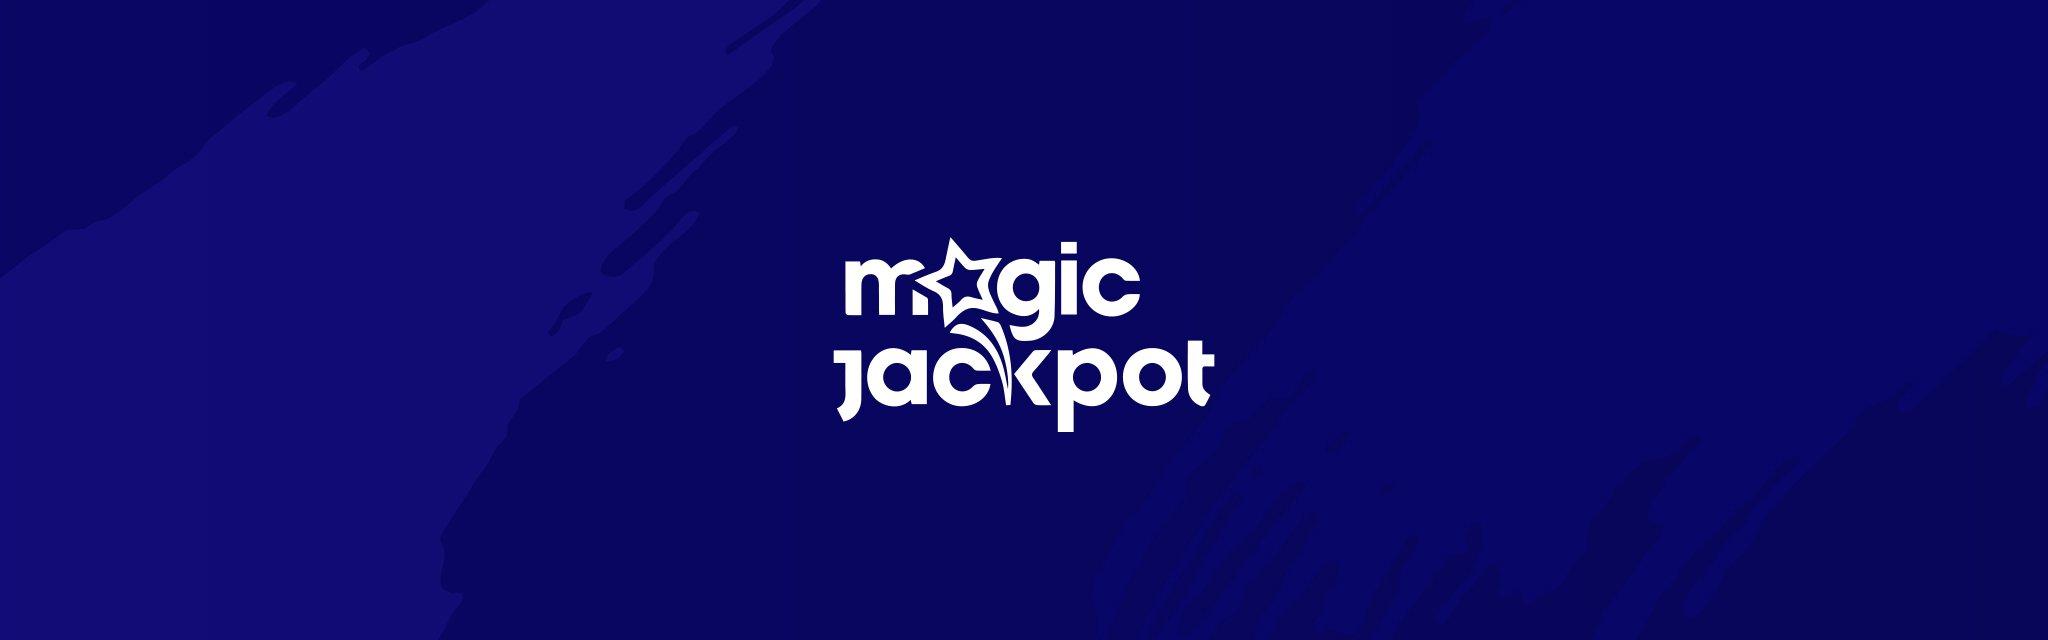 GiG Magic Jackpot